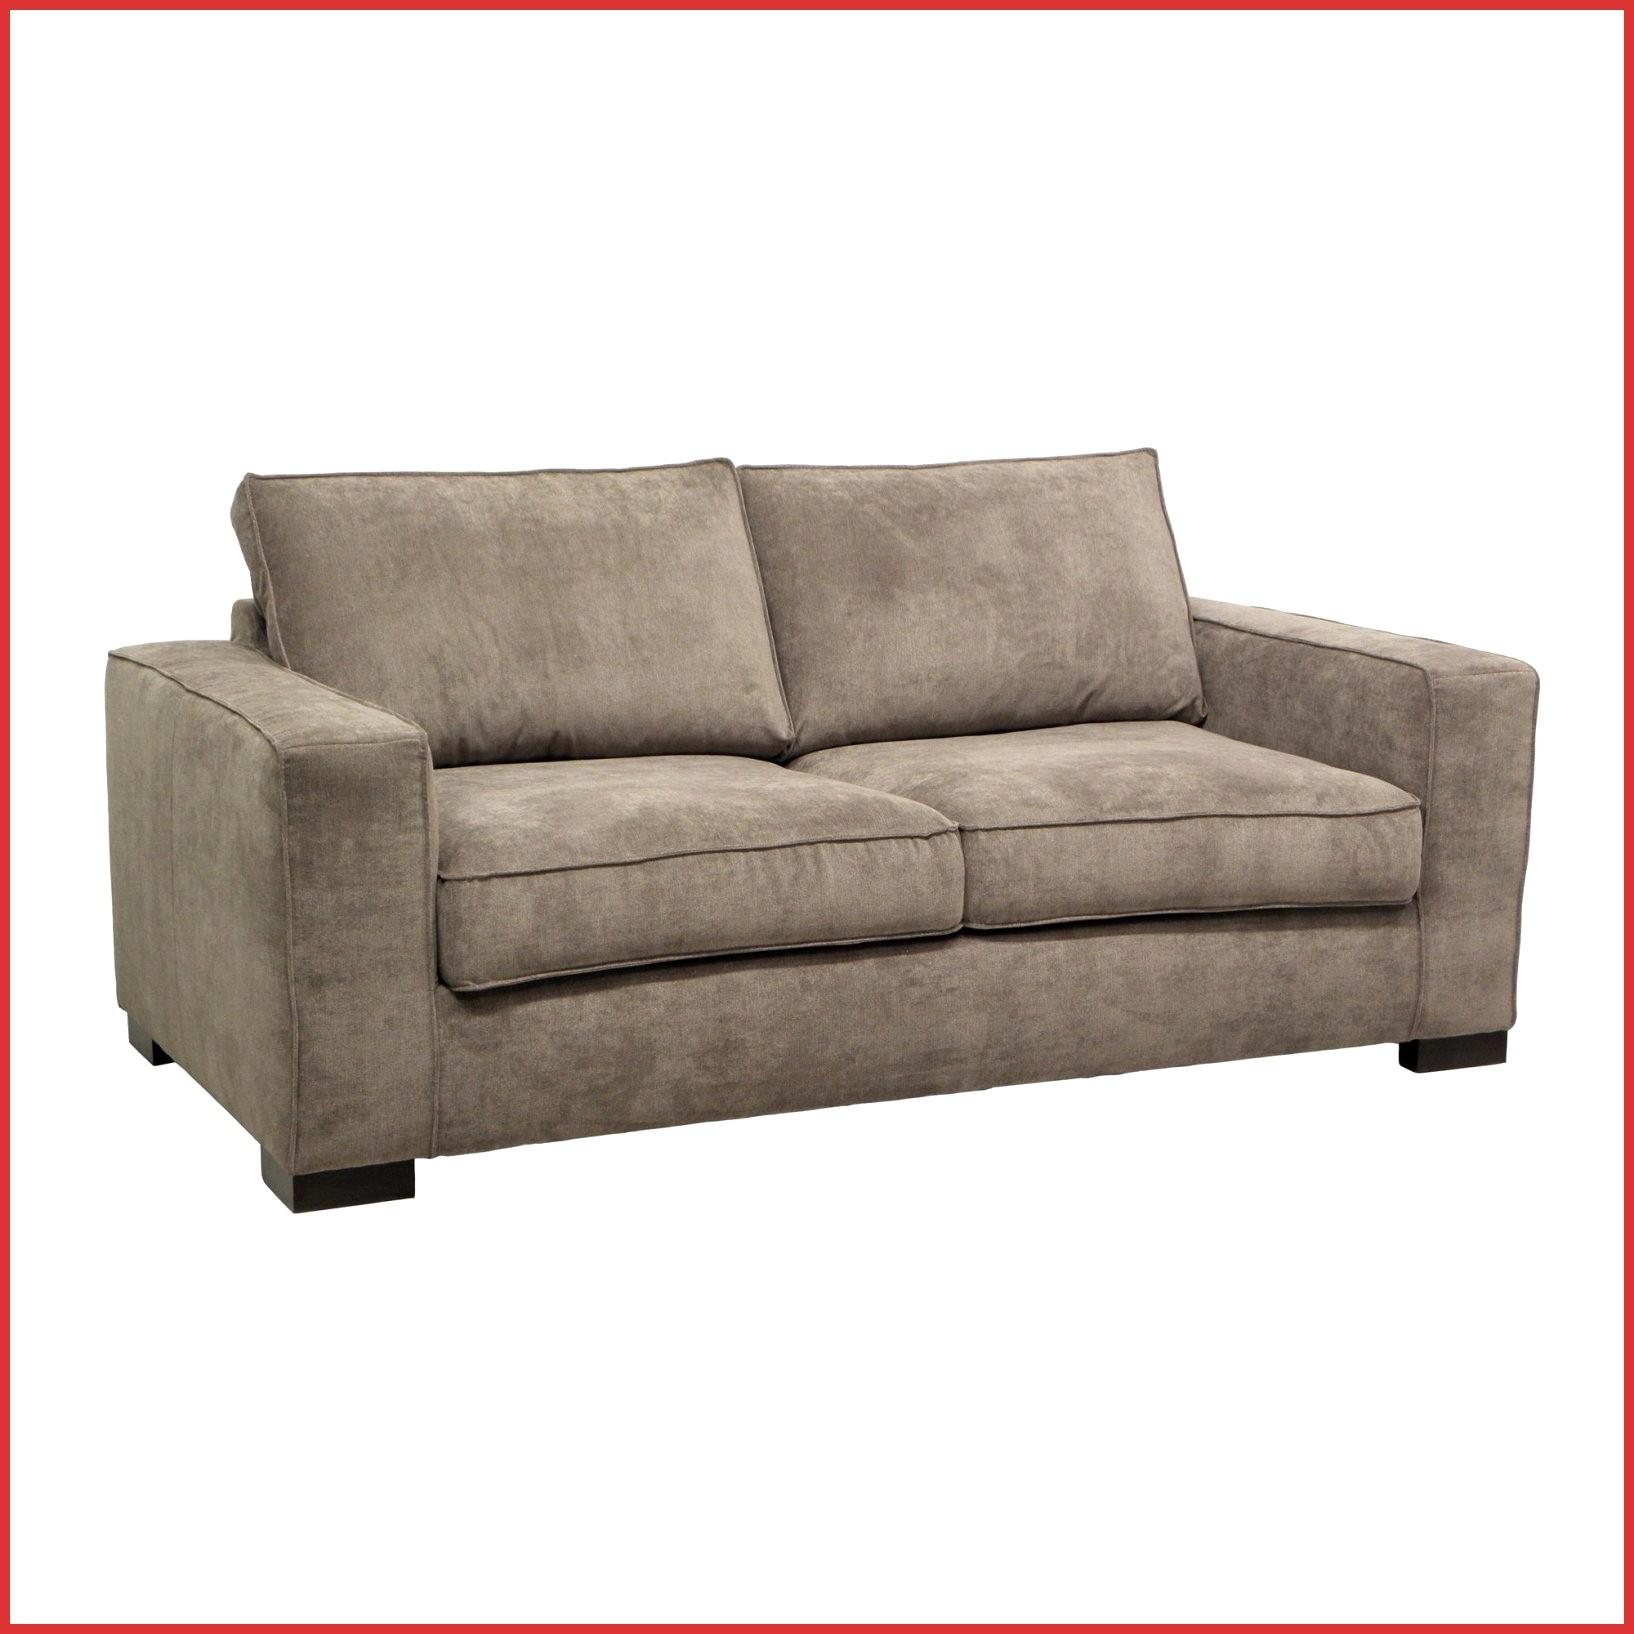 Canapé Angle Ikea Convertible Impressionnant Images Canap Convertible 3 Places Conforama 11 Lit 2 Pas Cher Ikea but